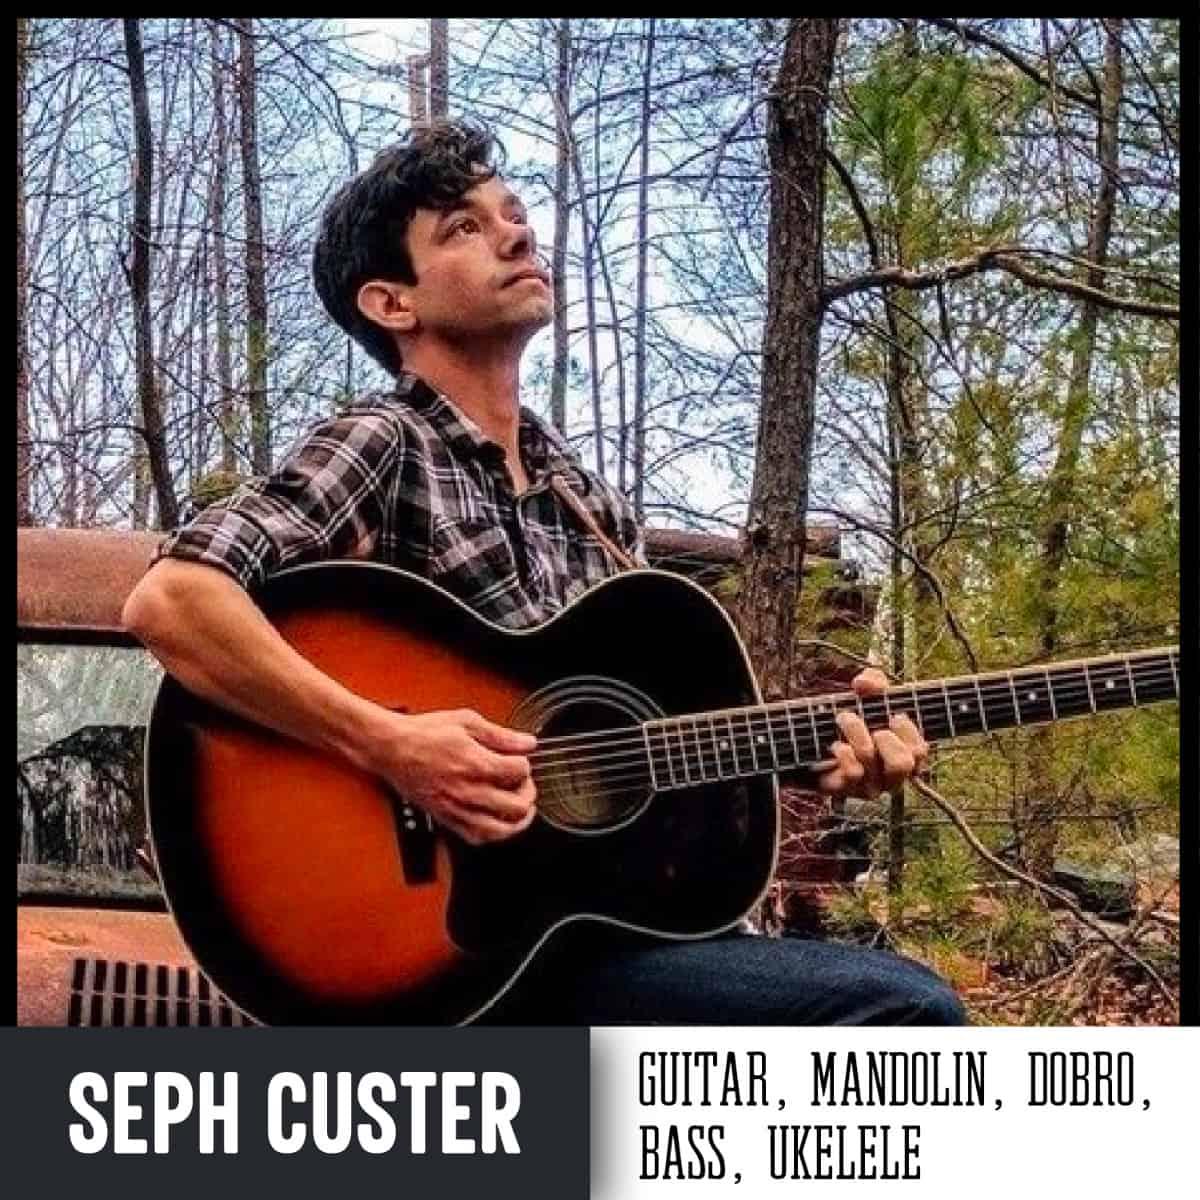 Handmade Music School Teacher Seph Custer